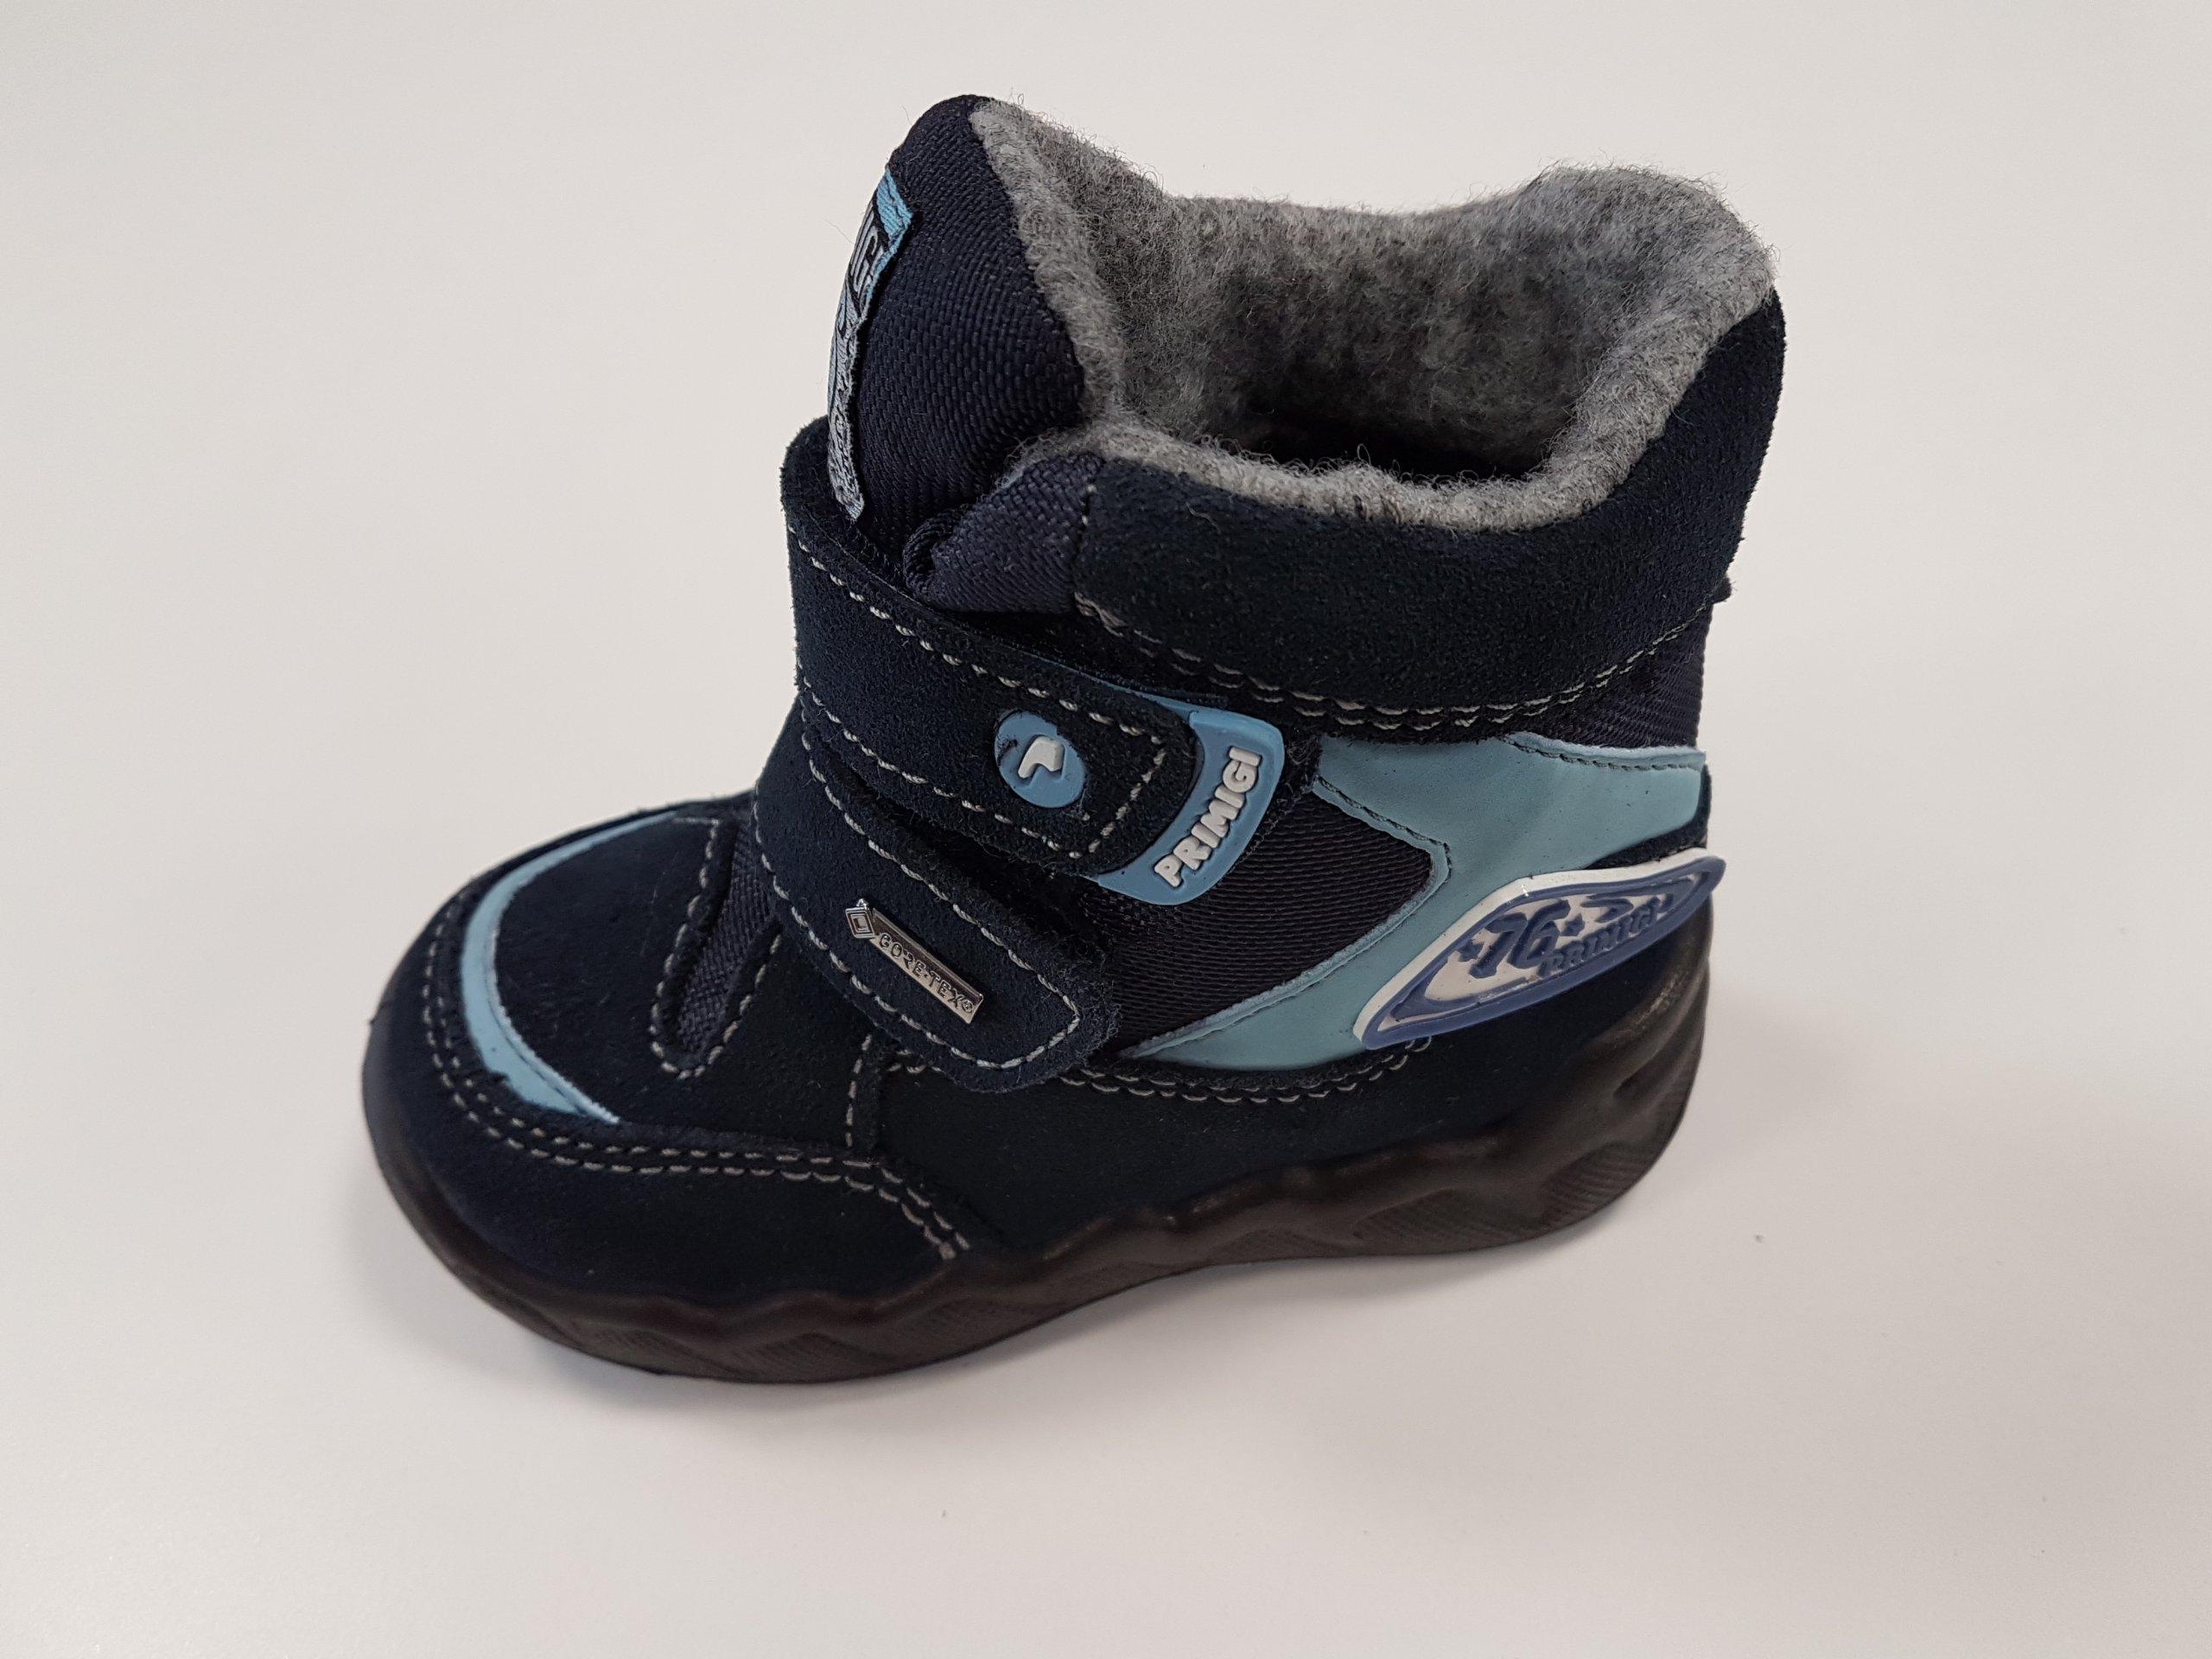 PRIMIGI śniegowce 85571/77, kozaki r 24 (15,8 cm